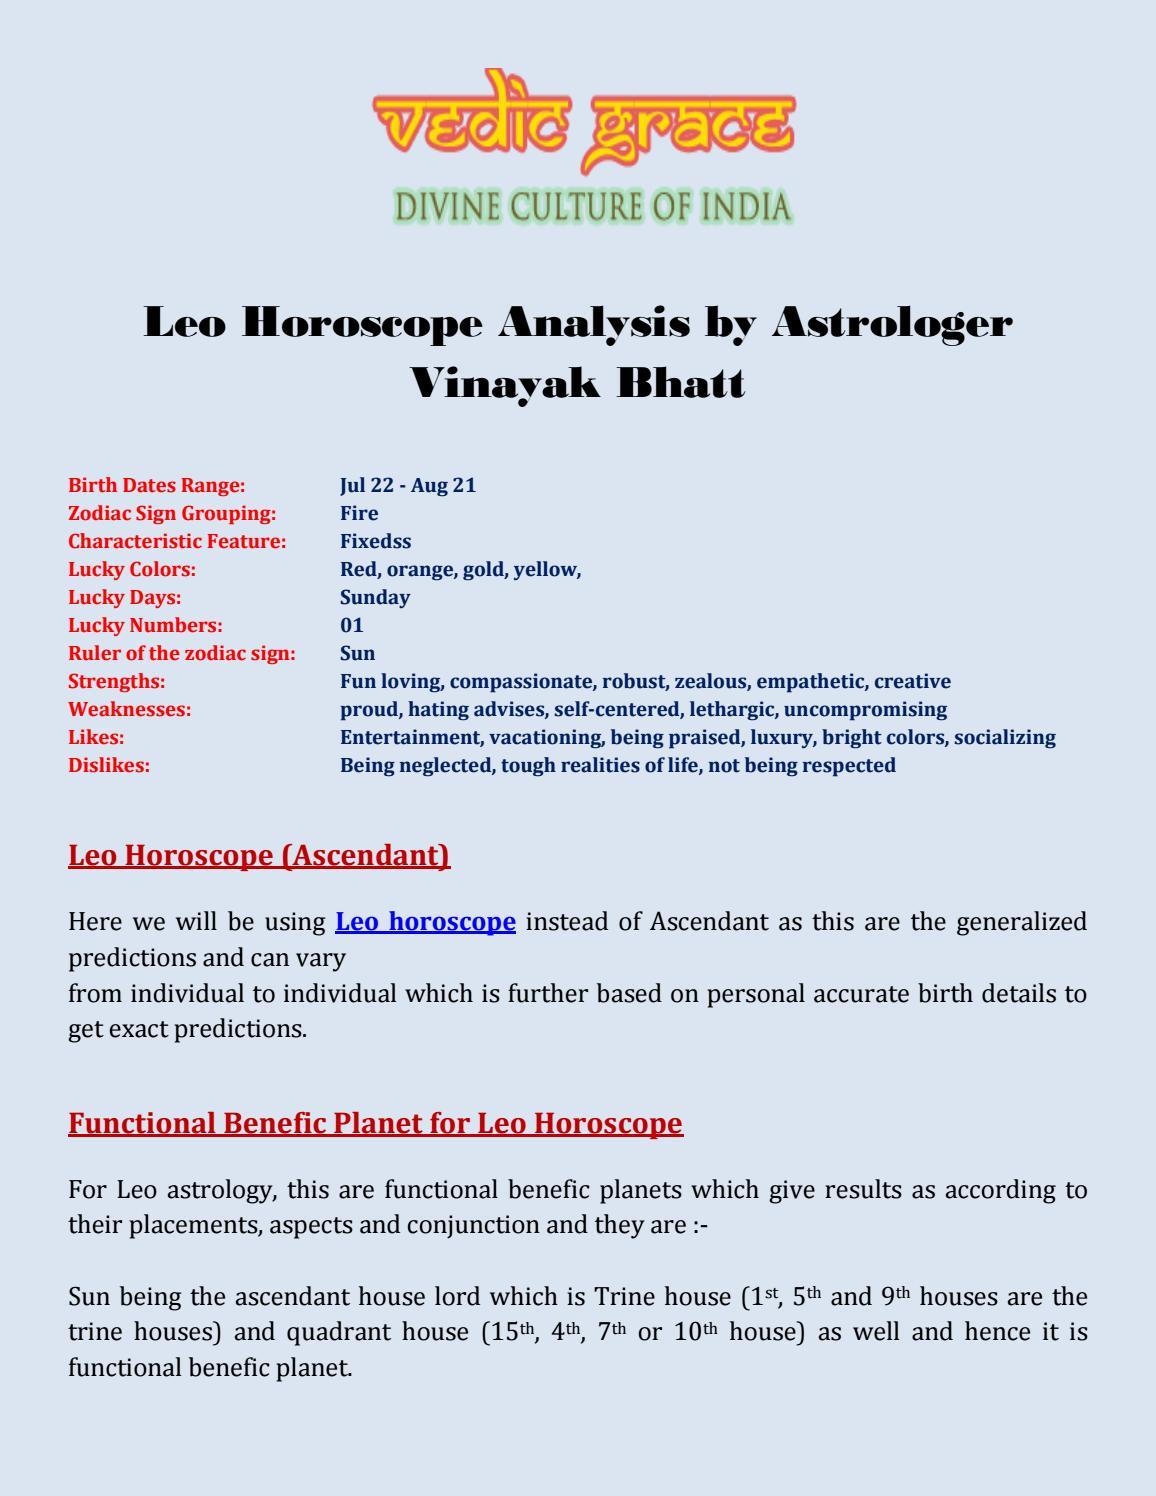 Leo Horoscope Analysis by Astrologer Vinayak Bhatt by